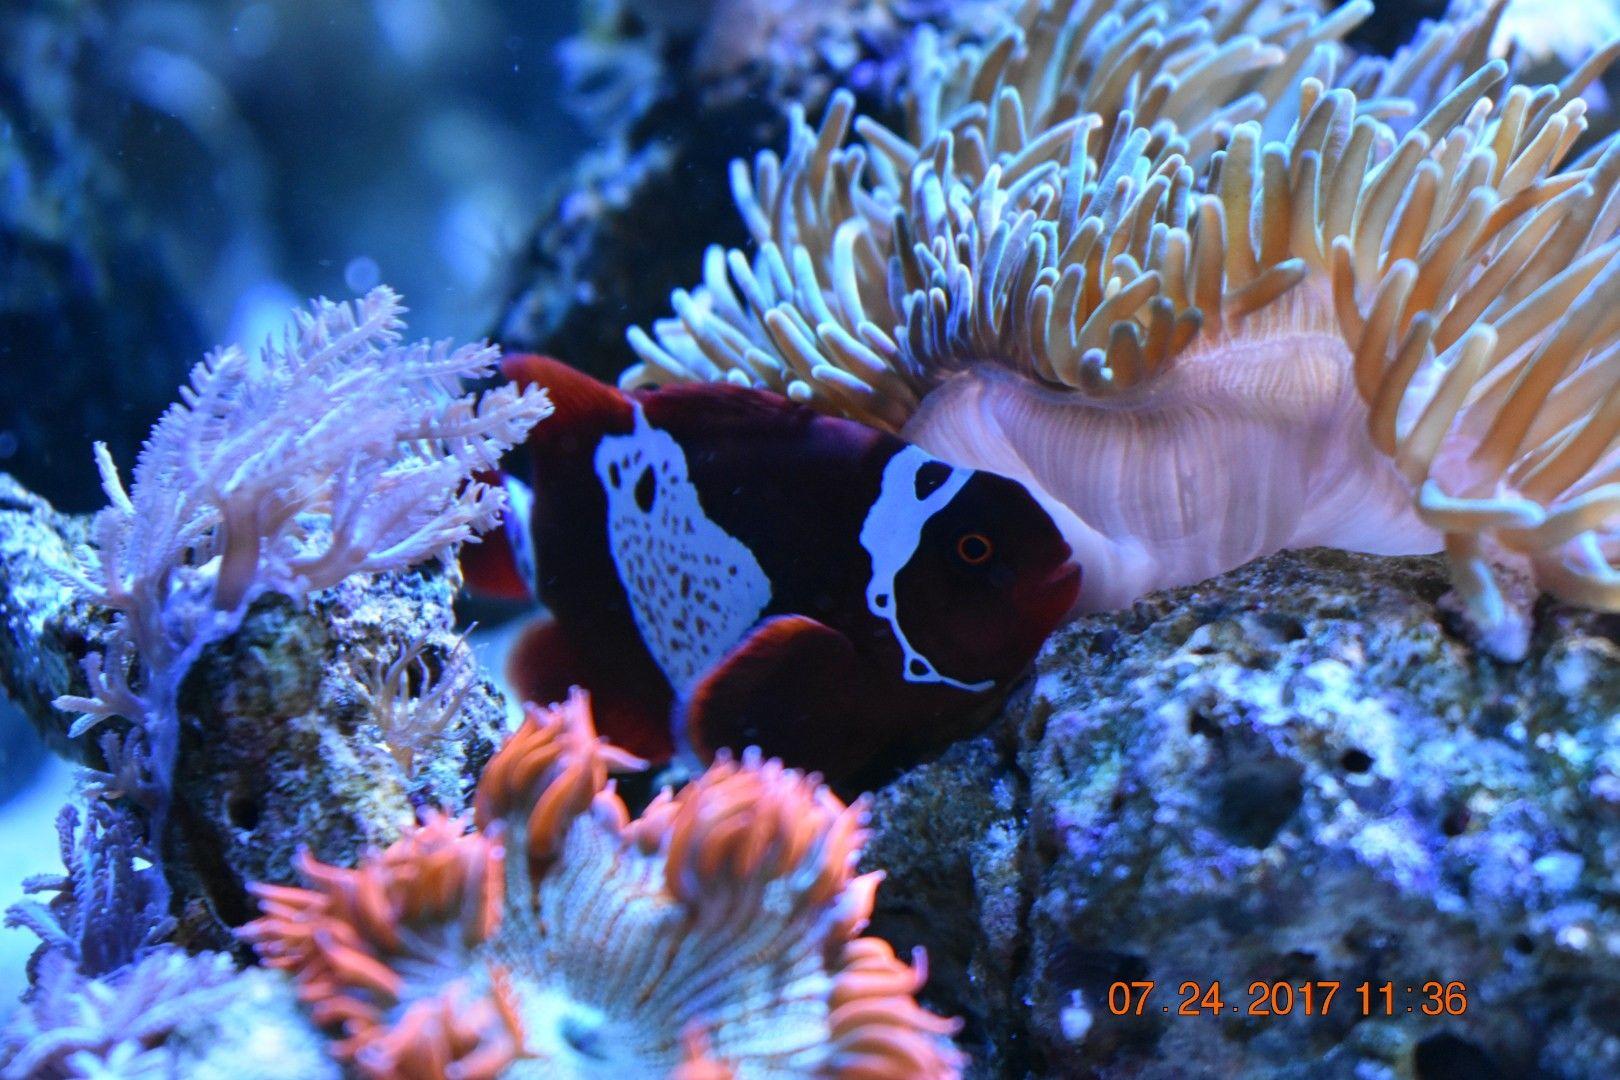 My Lightning Maroon Clown Anubis Fish Pet Ocean Life Pets